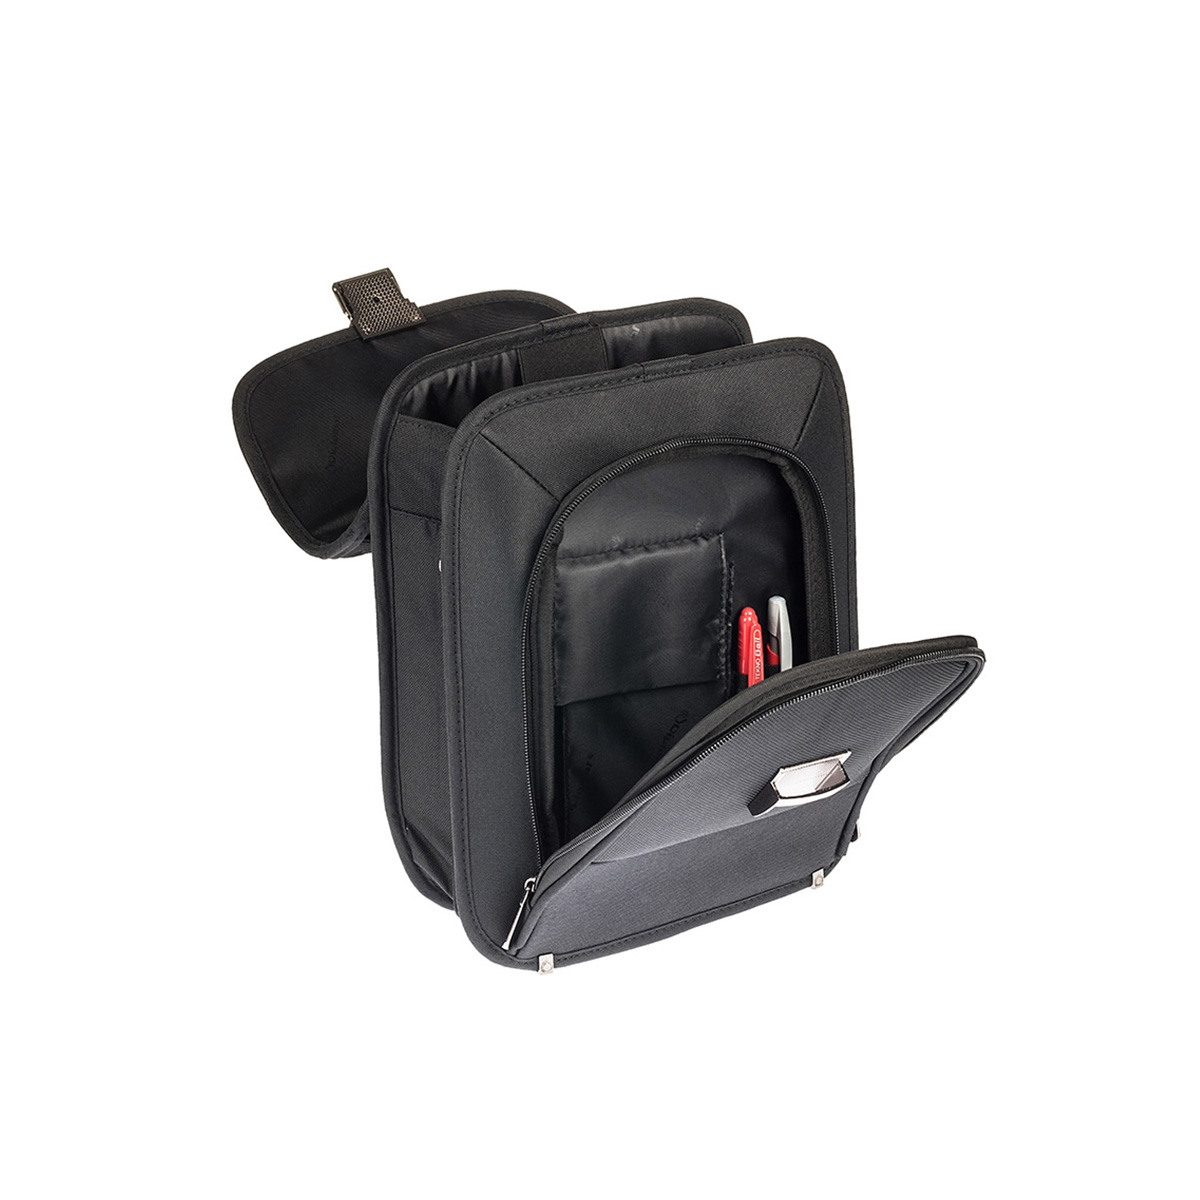 9e989e37be Επαγγελματική Τσάντα Όρθια – Χαρτοφύλακας Tablet 10.1 Diplomat 32cm BL210  Μαύρη